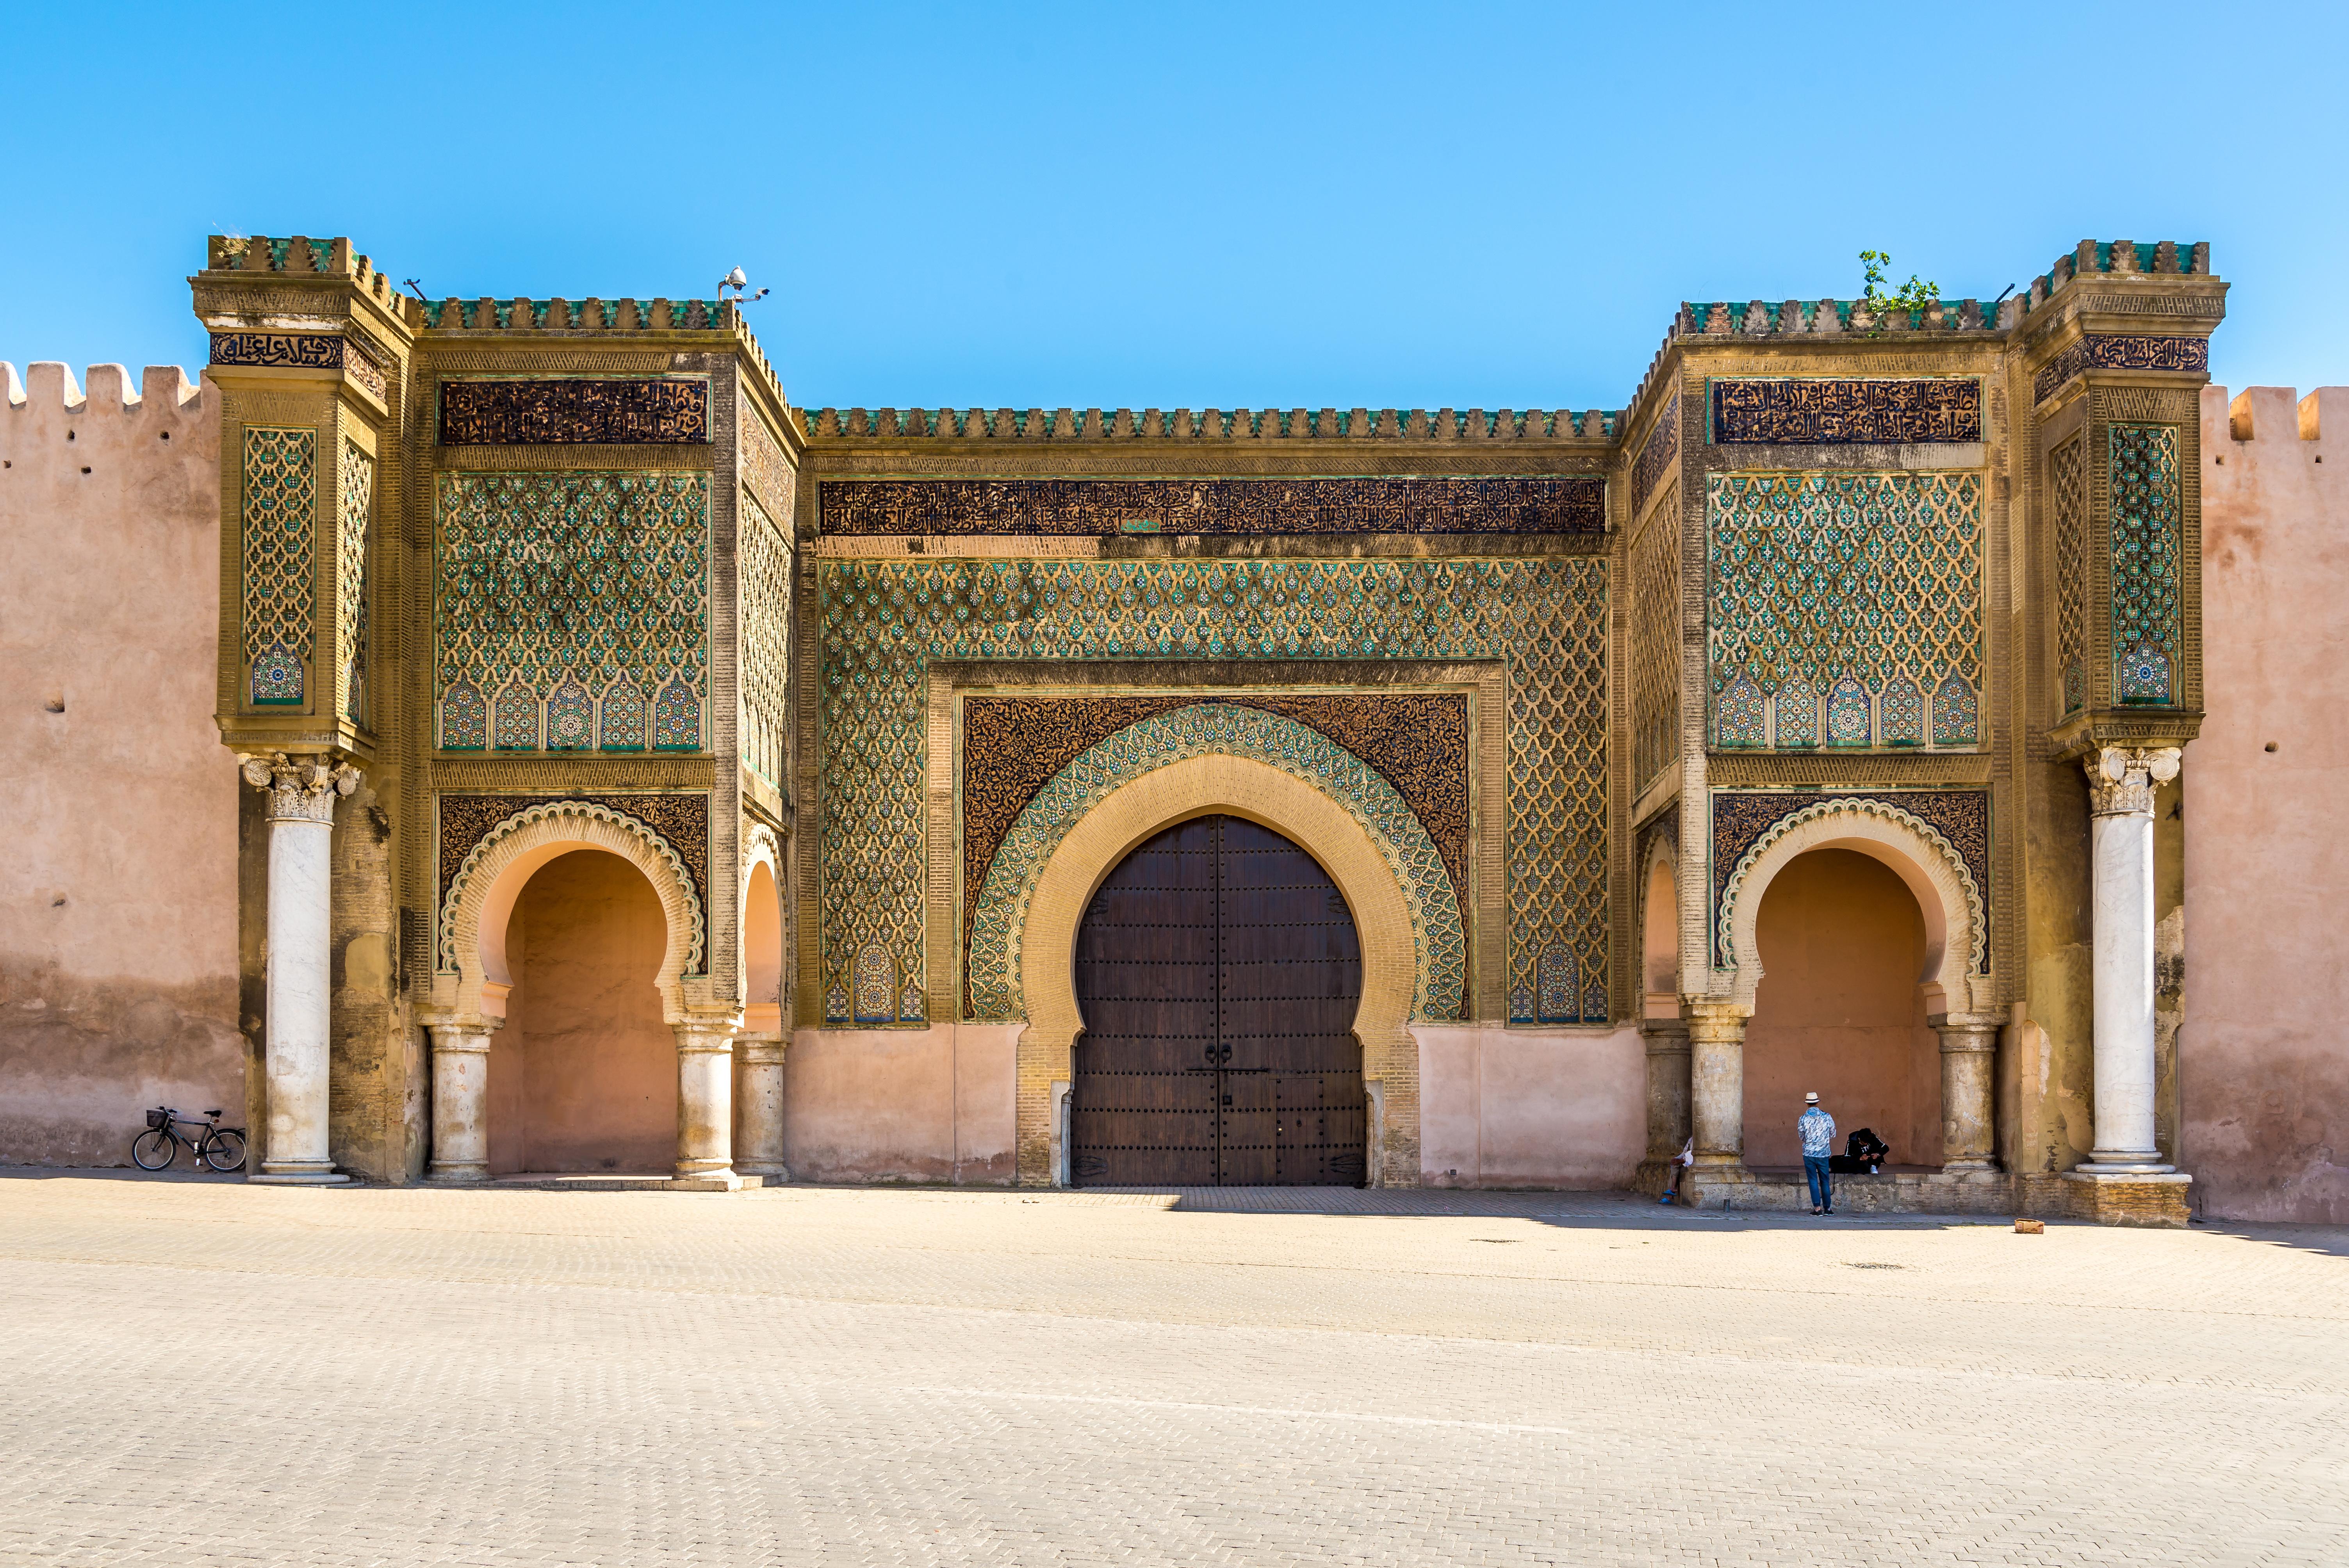 La puerta Bab El Mansour, en Meknes